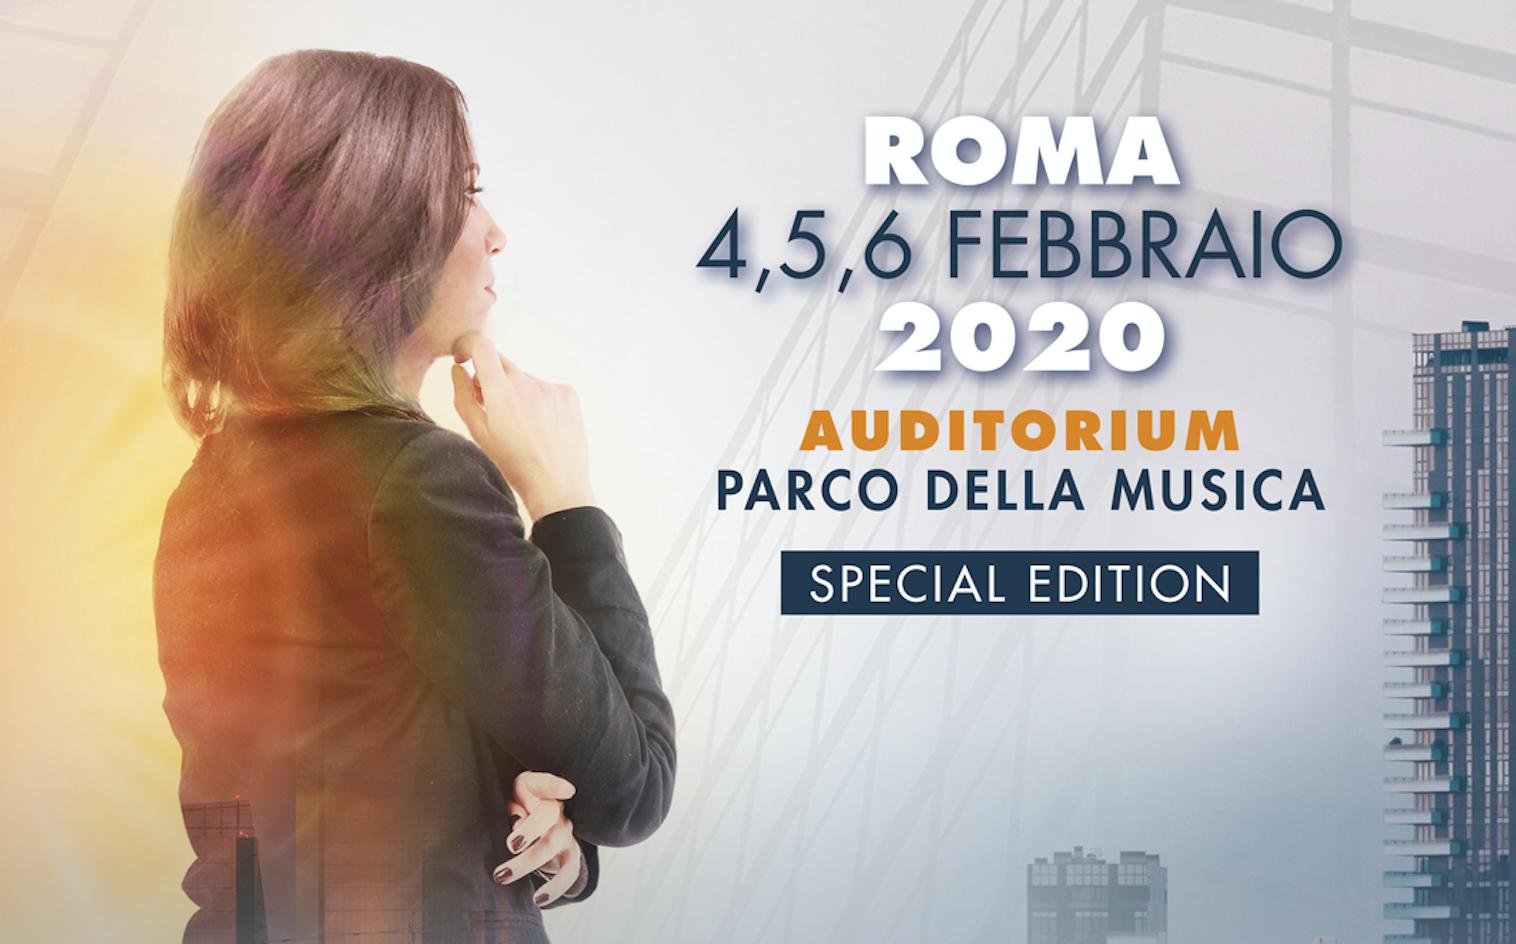 ConsulenTia20 al via, attesi oltre 3mila partecipanti all'Auditorium di Roma